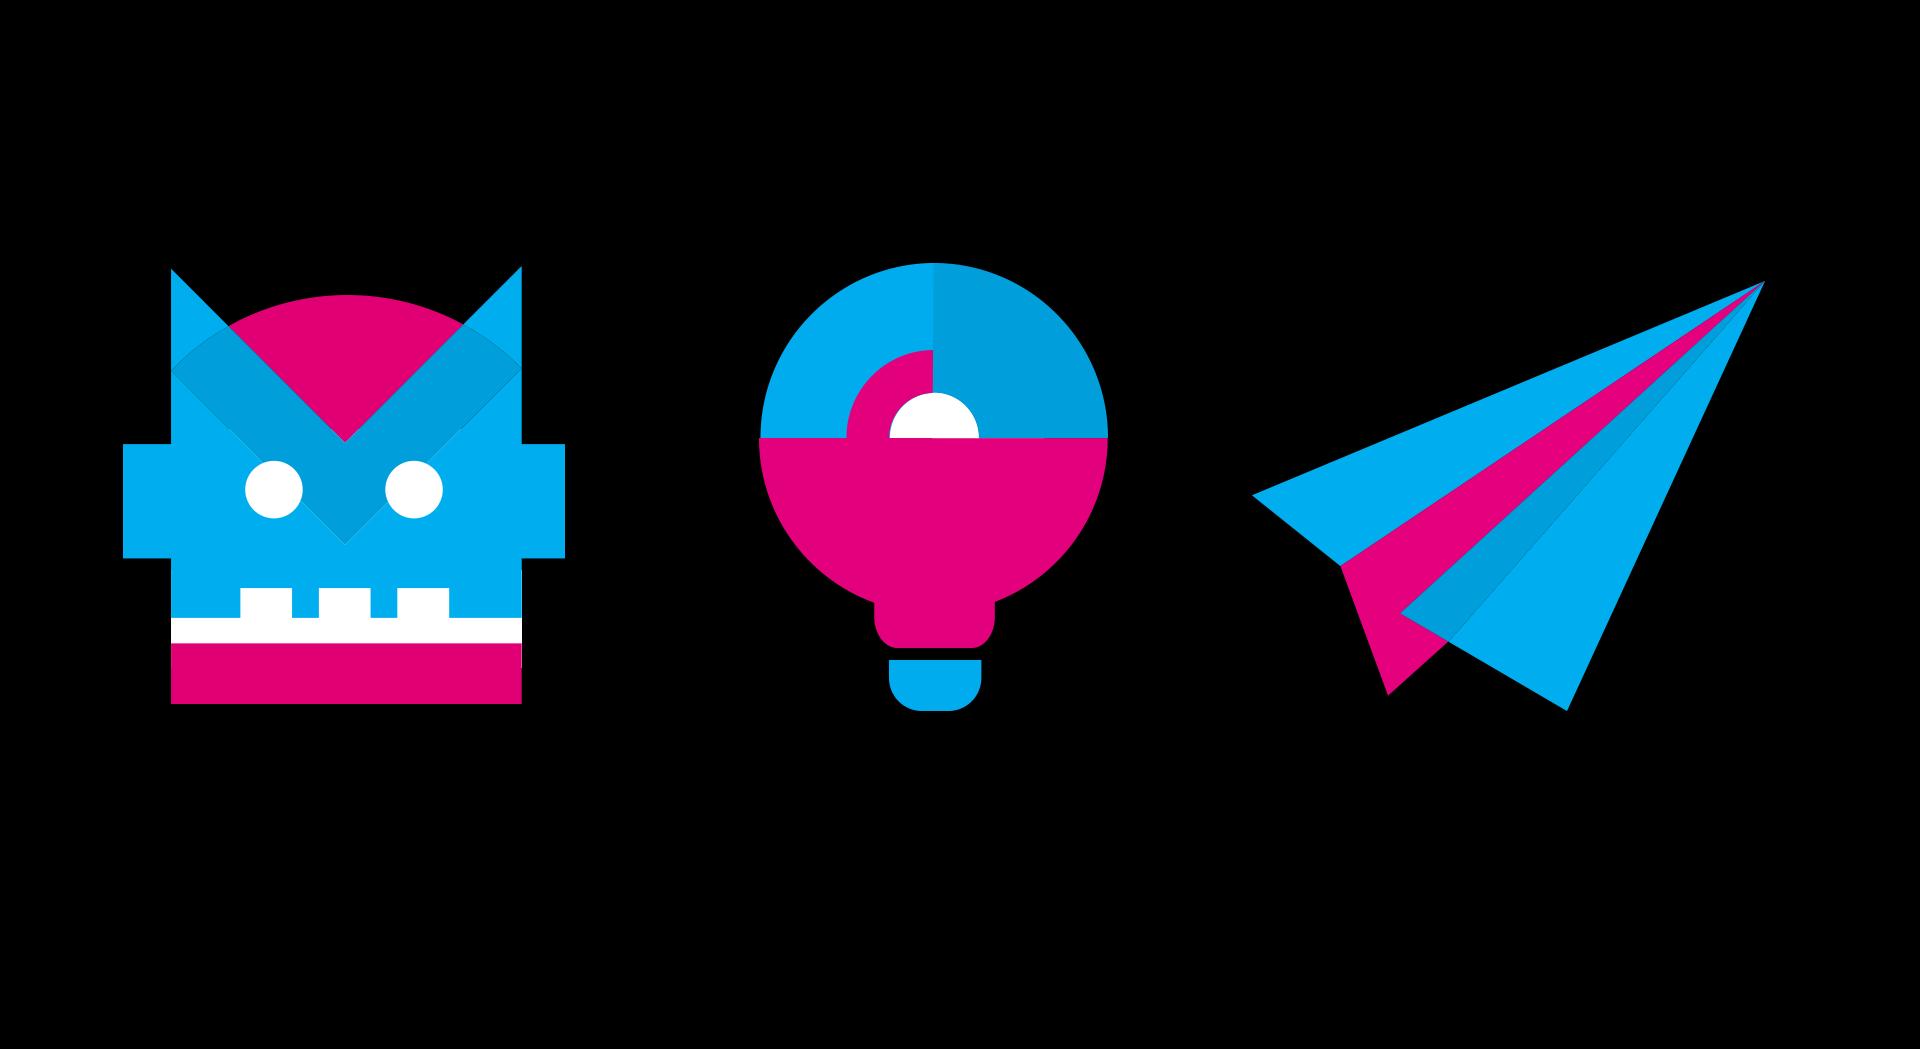 Svenja Limke <strong>Icon Set</strong></br>hubraum – tech incubator of Deutsche Telekom